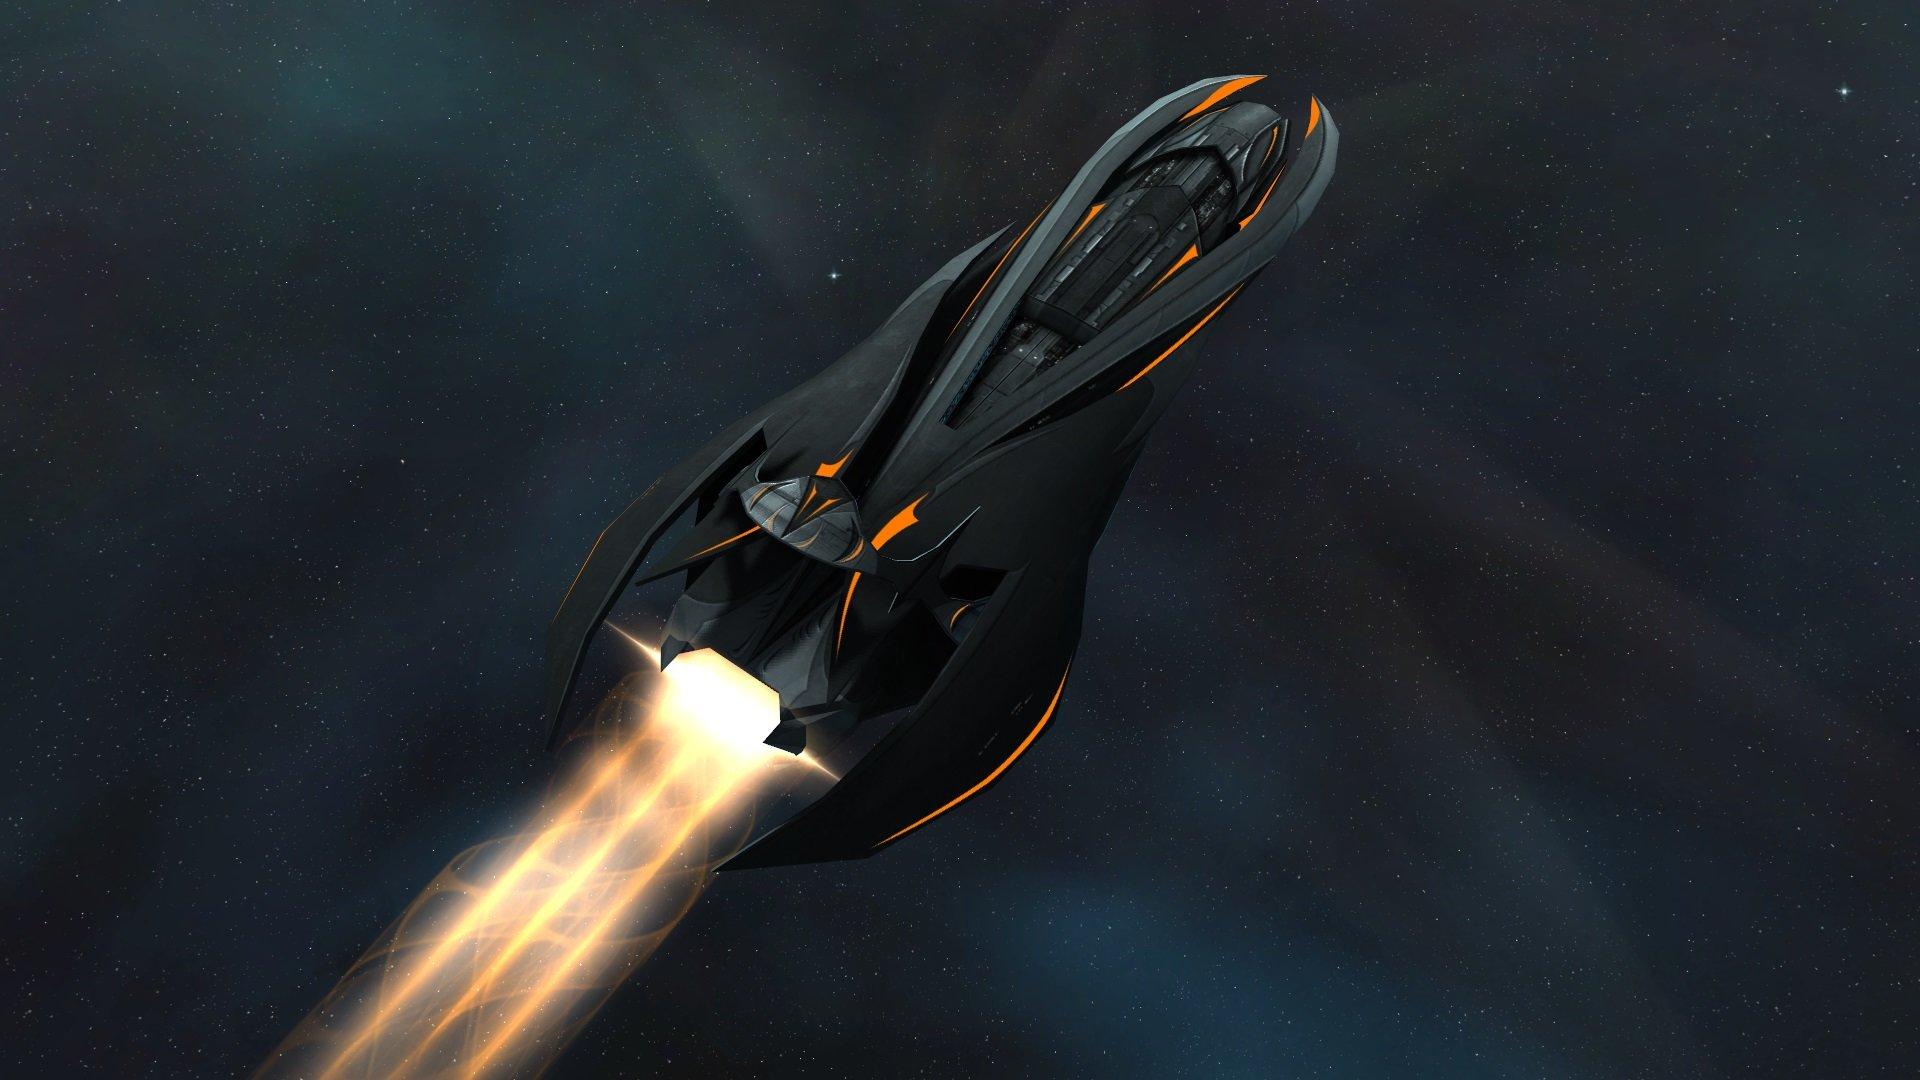 Download Hd 1920x1080 Sins Of A Solar Empire Rebellion Computer